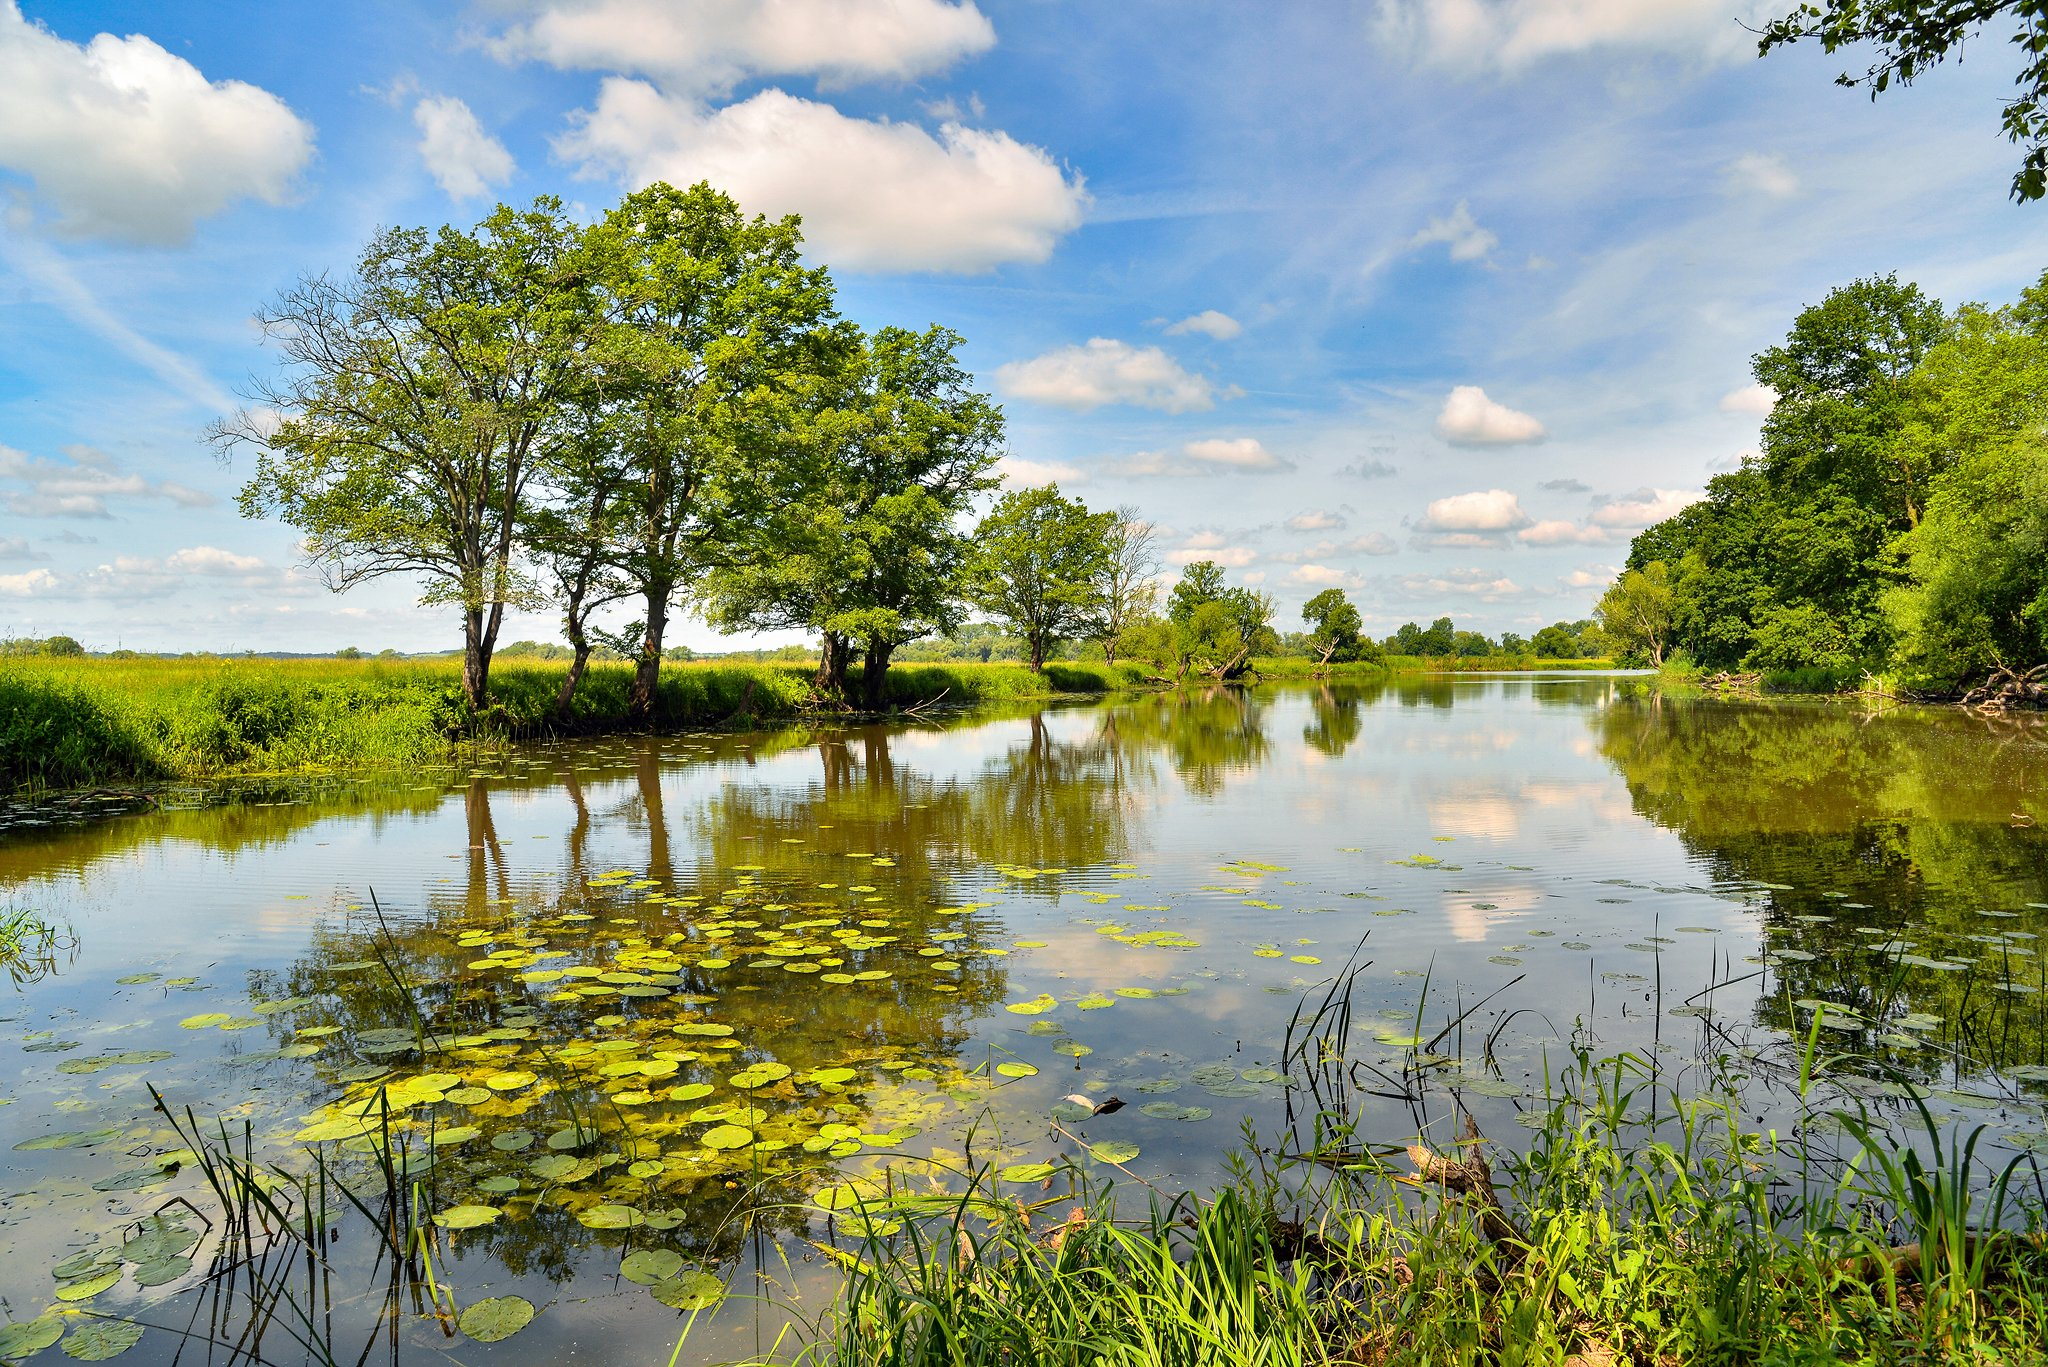 odertal national park water tree trees clouds sky green schwedt oder lake, Radoslaw Dranikowski